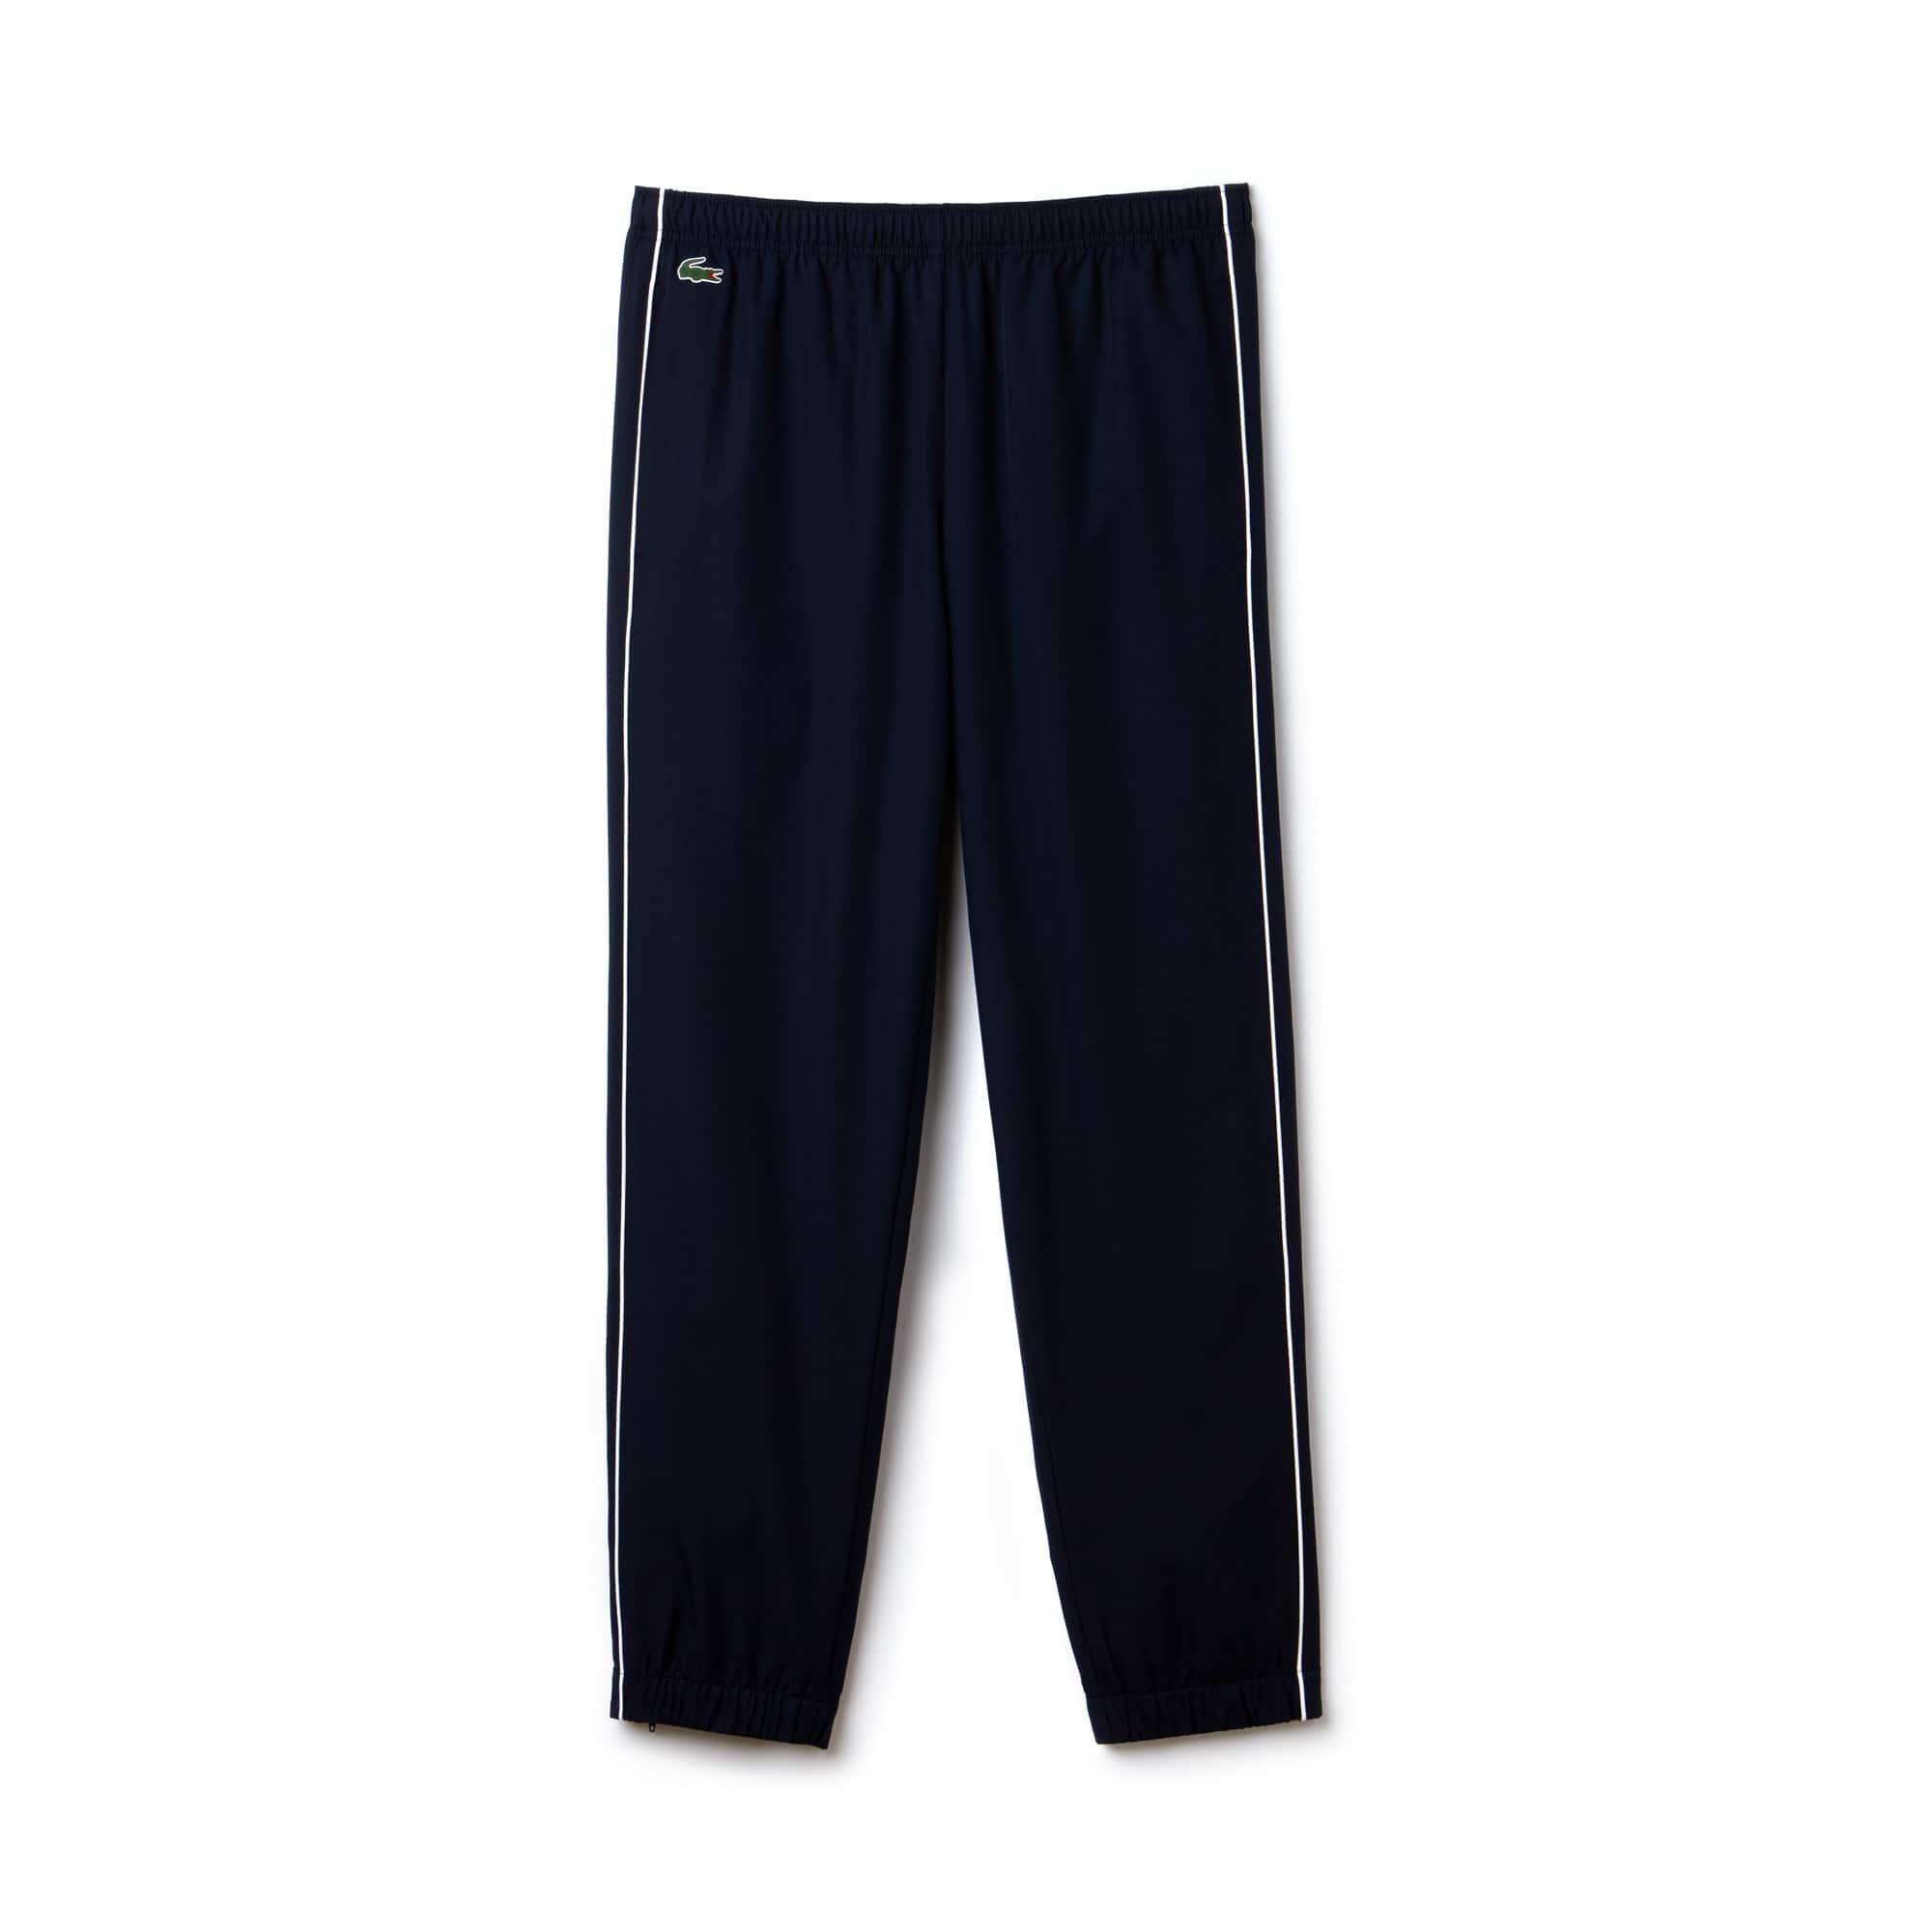 Men's Lacoste SPORT Piped Taffeta Sweatpants